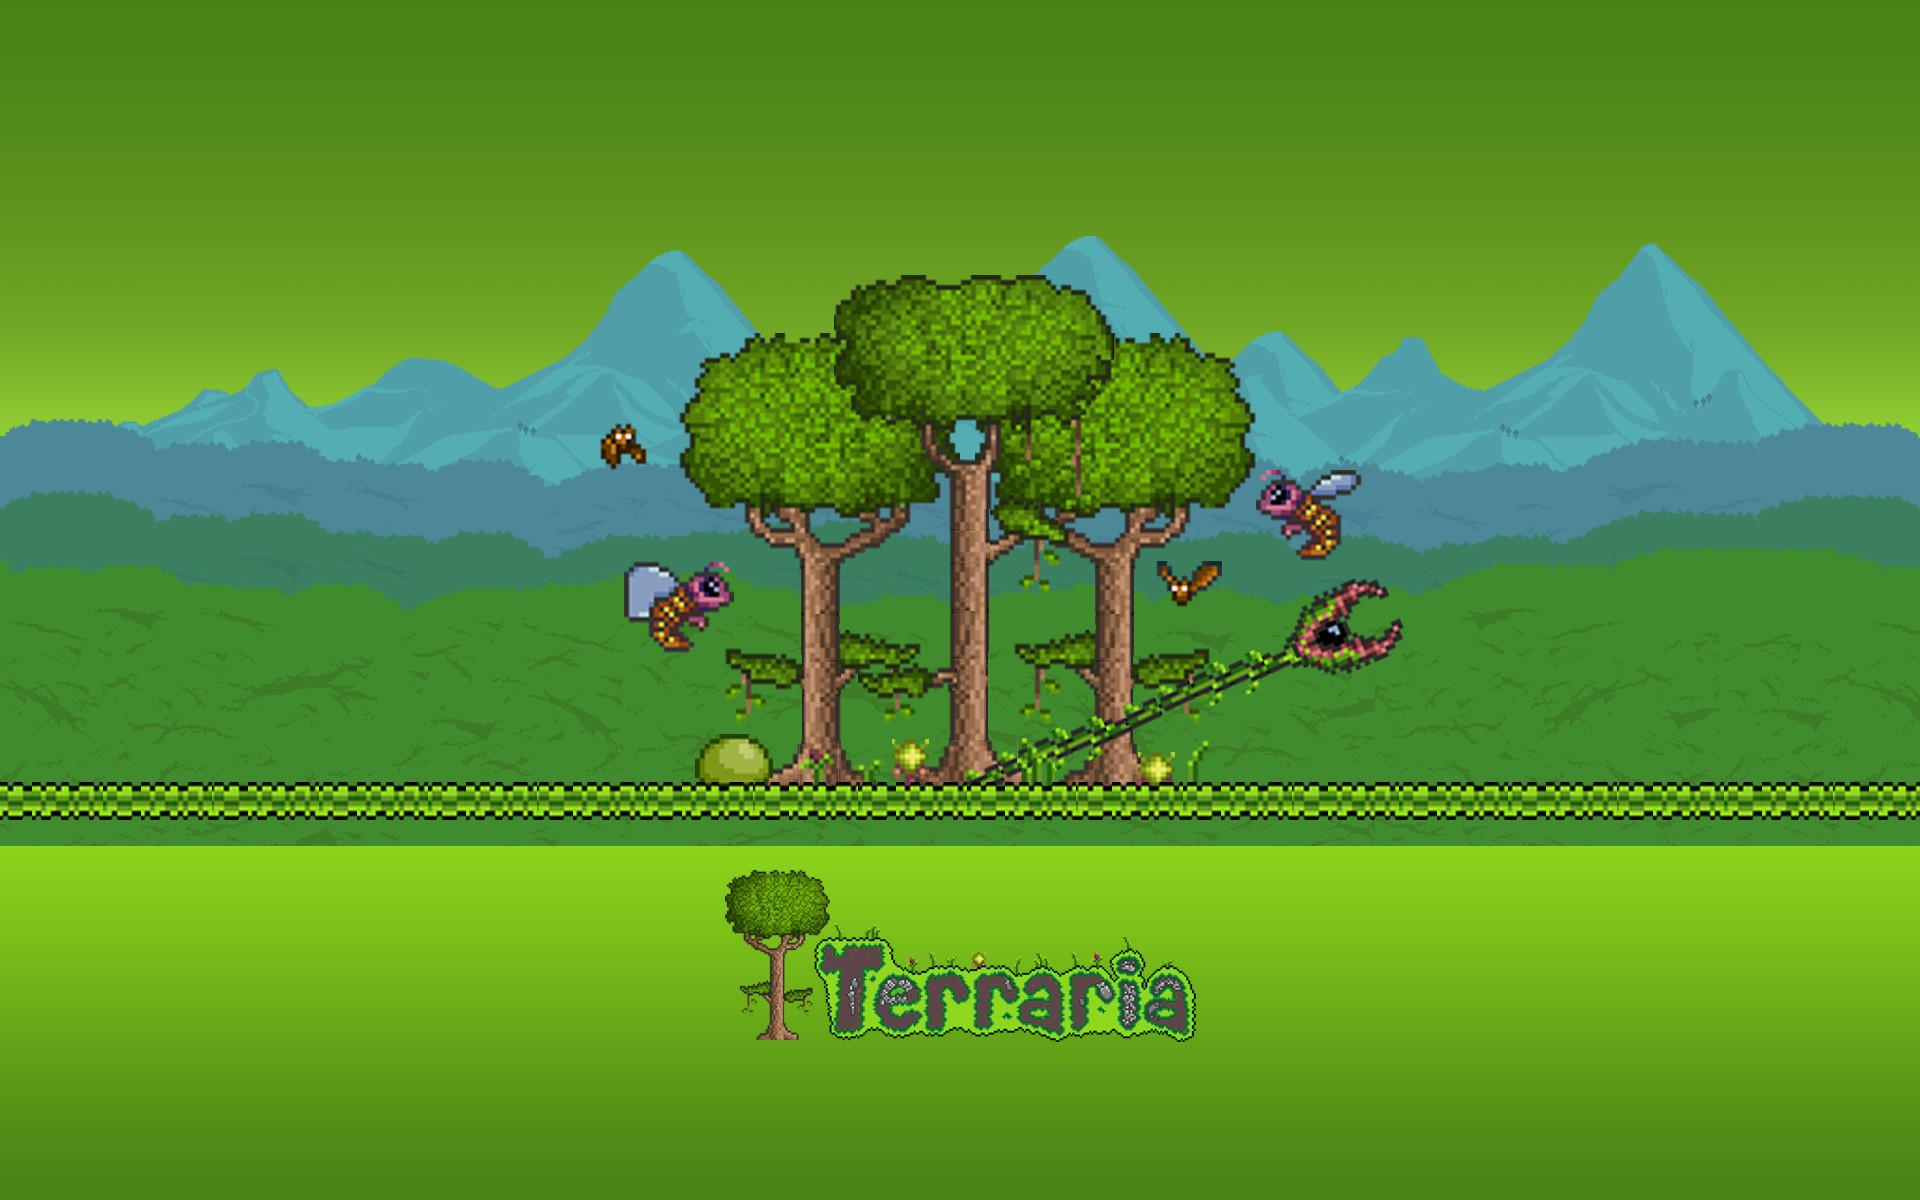 Terraria Wallpapers HD